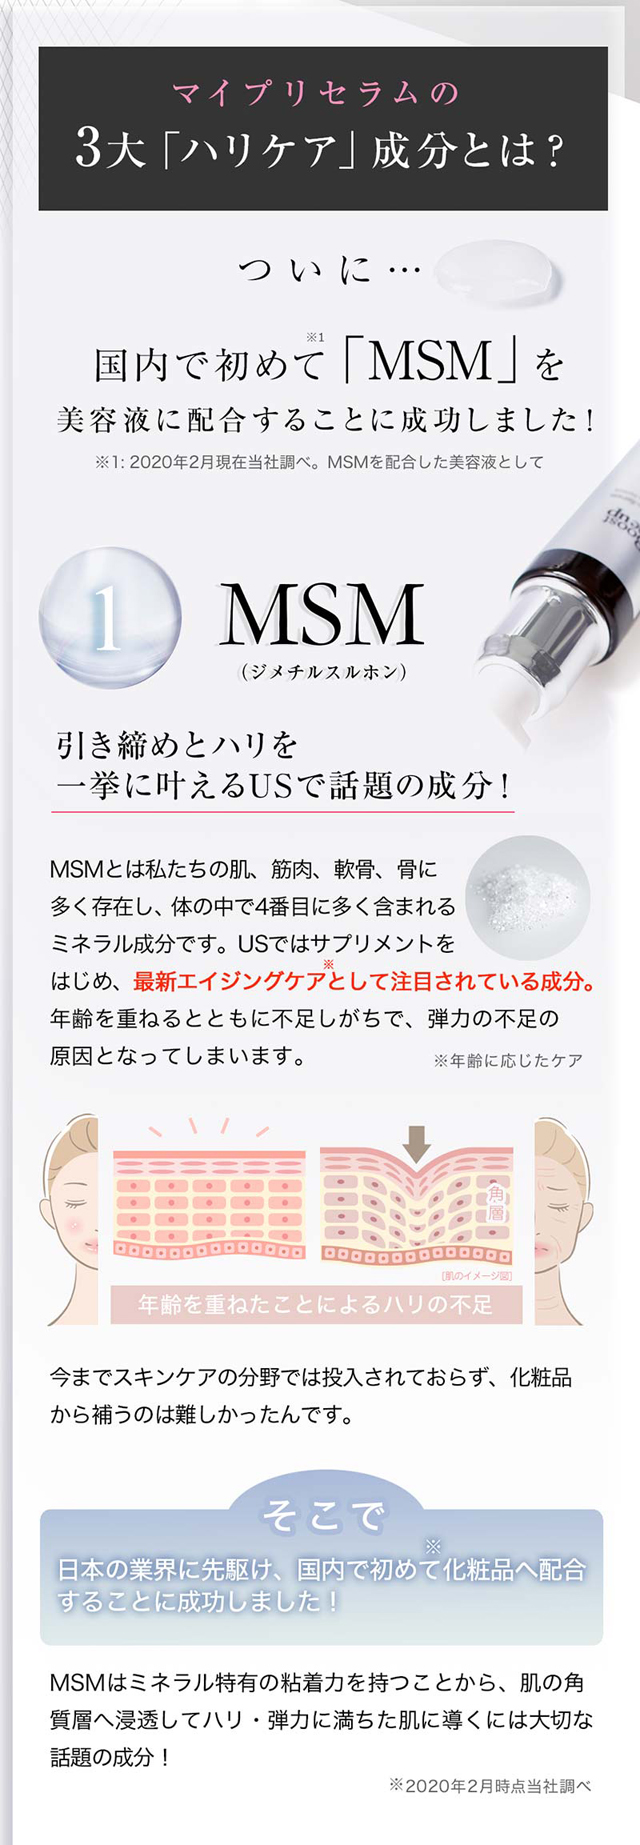 MyPre-Serum(マイプリセラム),特徴,効果